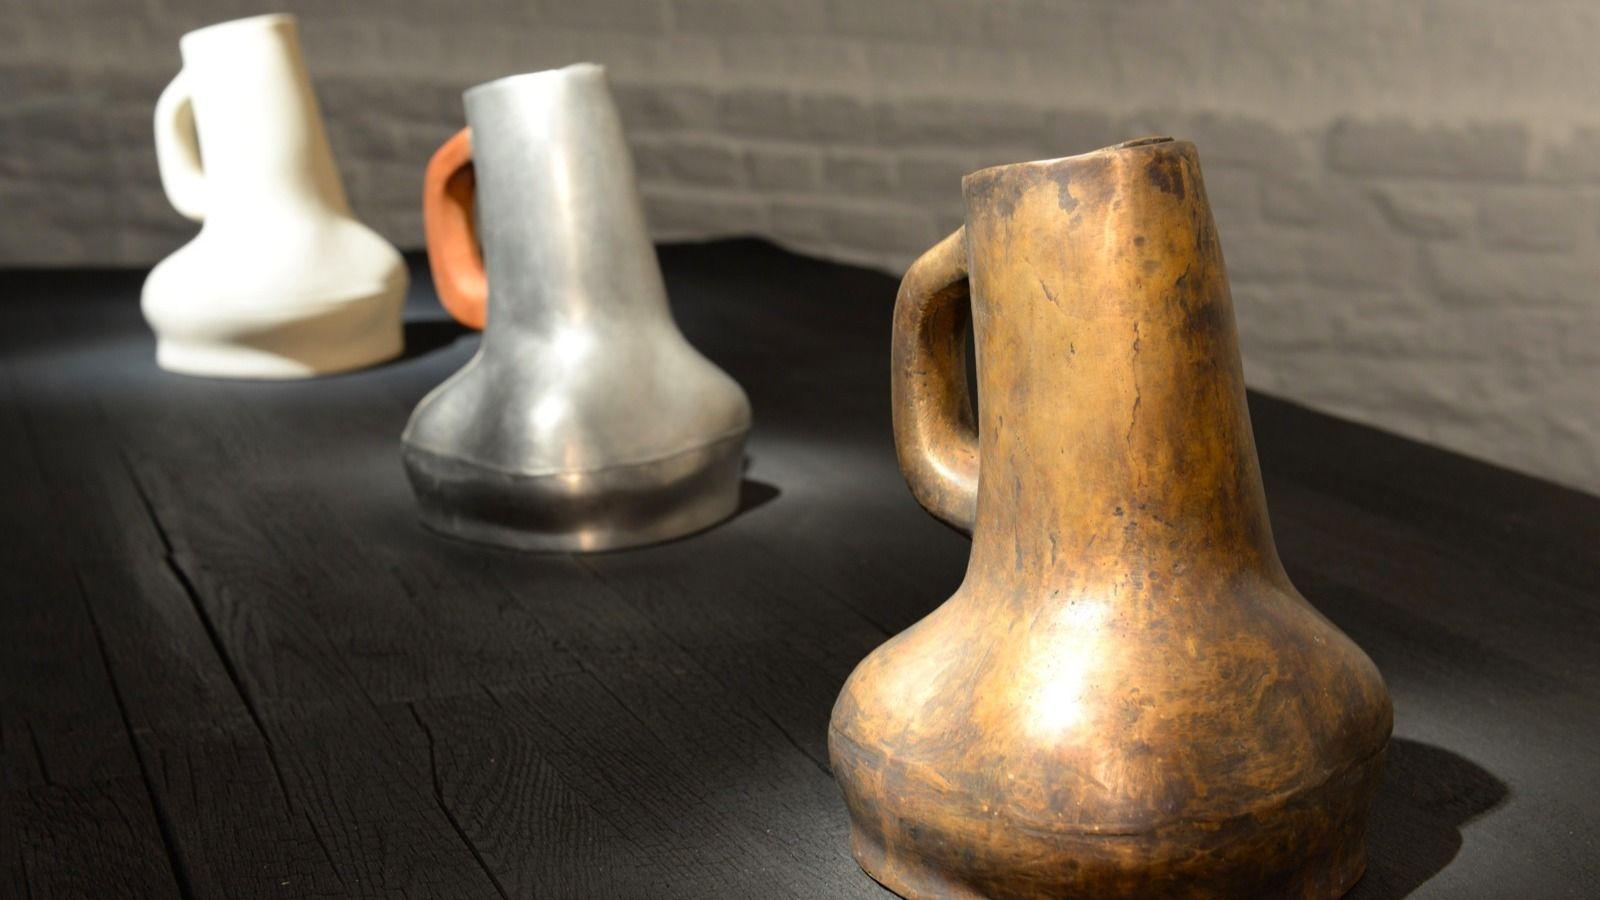 Futur Archaïque, Nacho Carbonell. Hot Kettles When will design find its new raison d'etre? - #Artemest #artemestmag